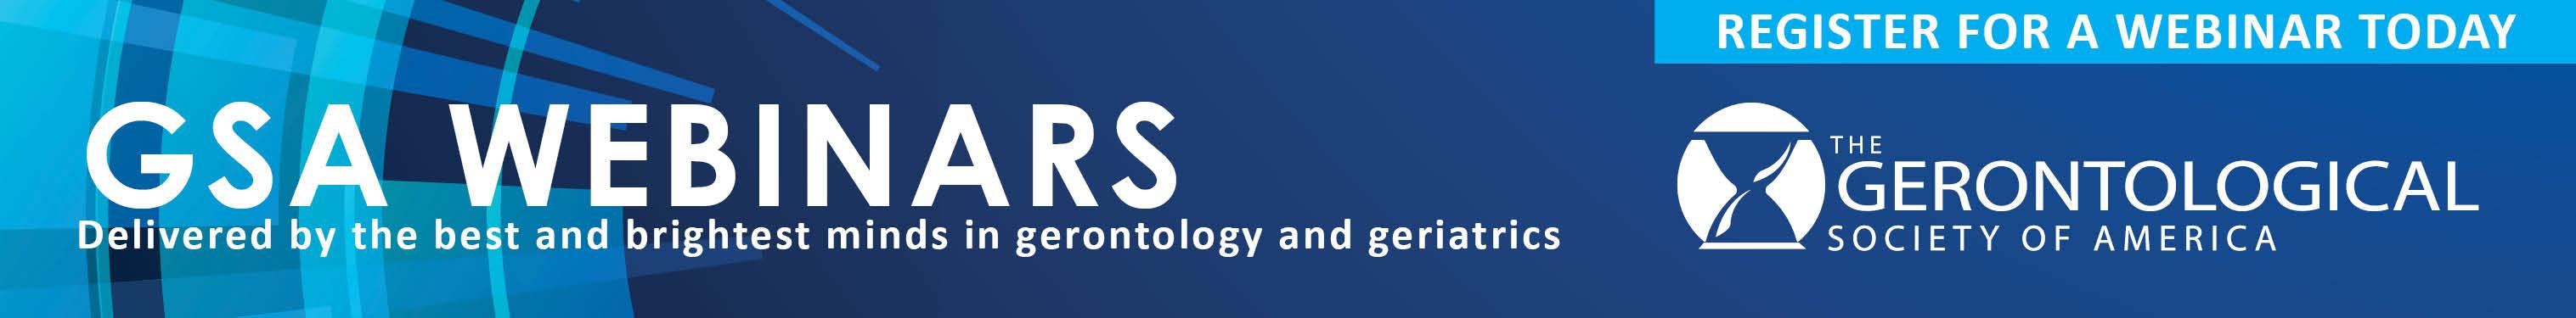 GSA Webinars